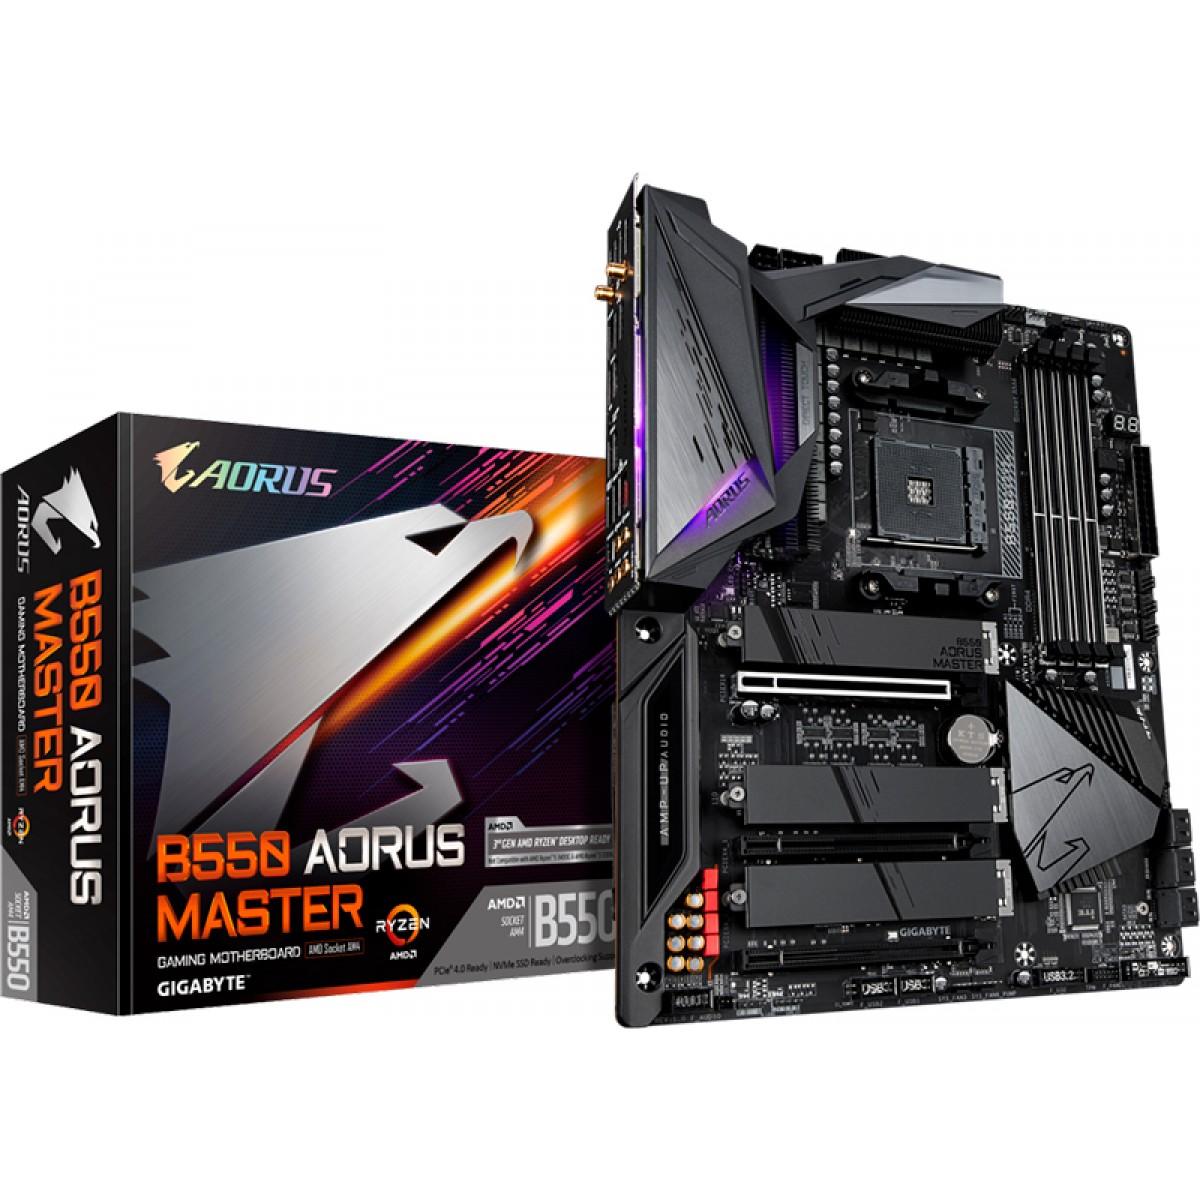 Placa Mãe Gigabyte B550 Aorus Master, Chipset B550, AMD AM4, ATX, DDR4